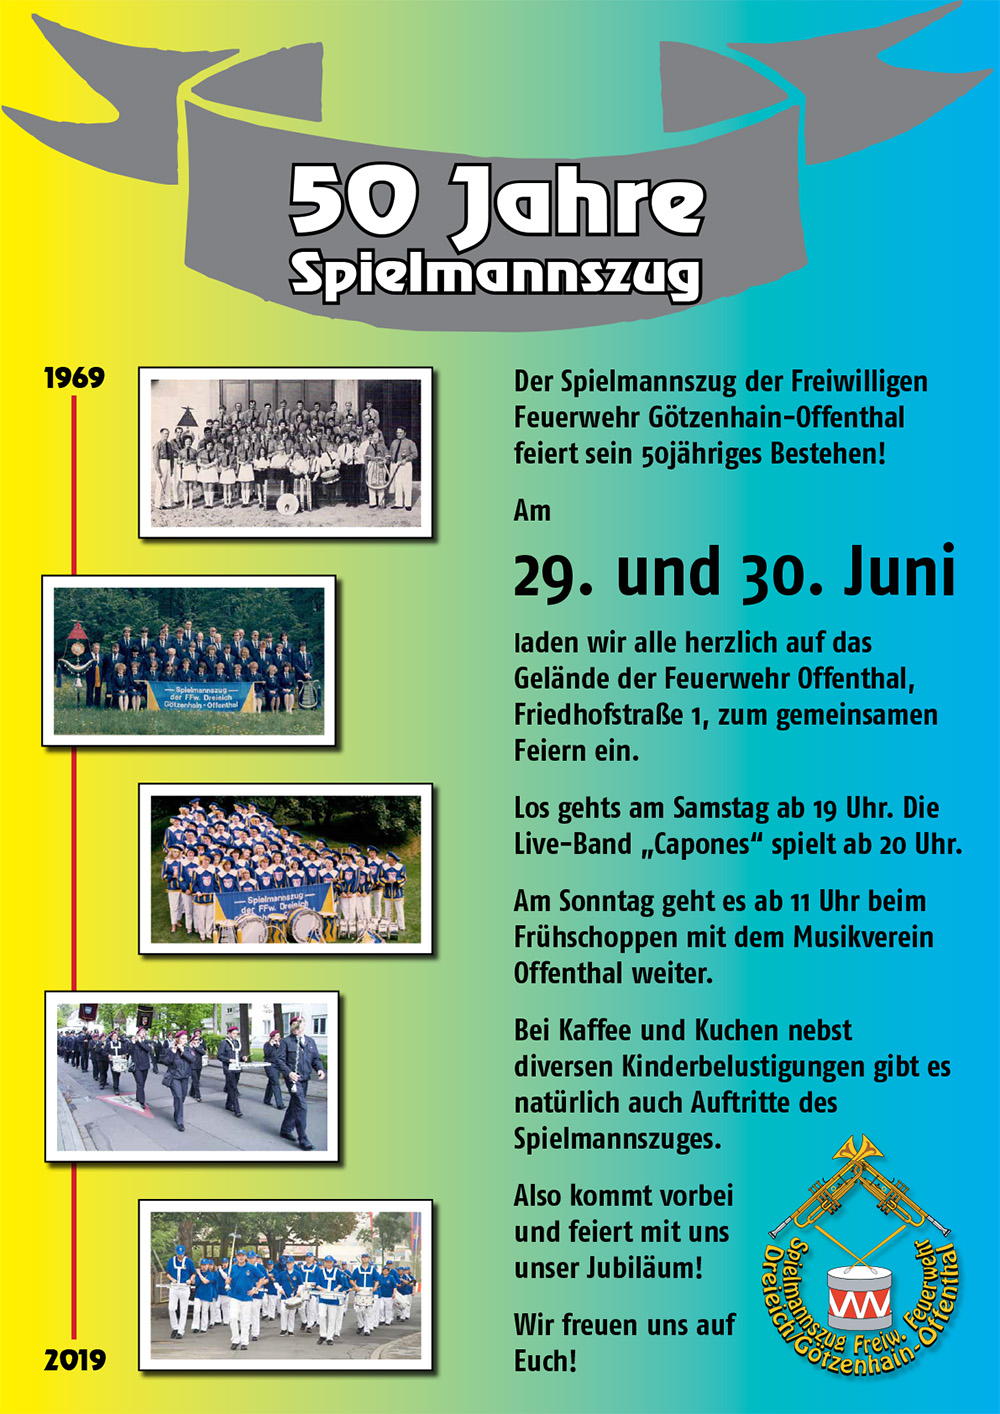 50 Jahre Spielmannszug Götzenhain-Offenthal